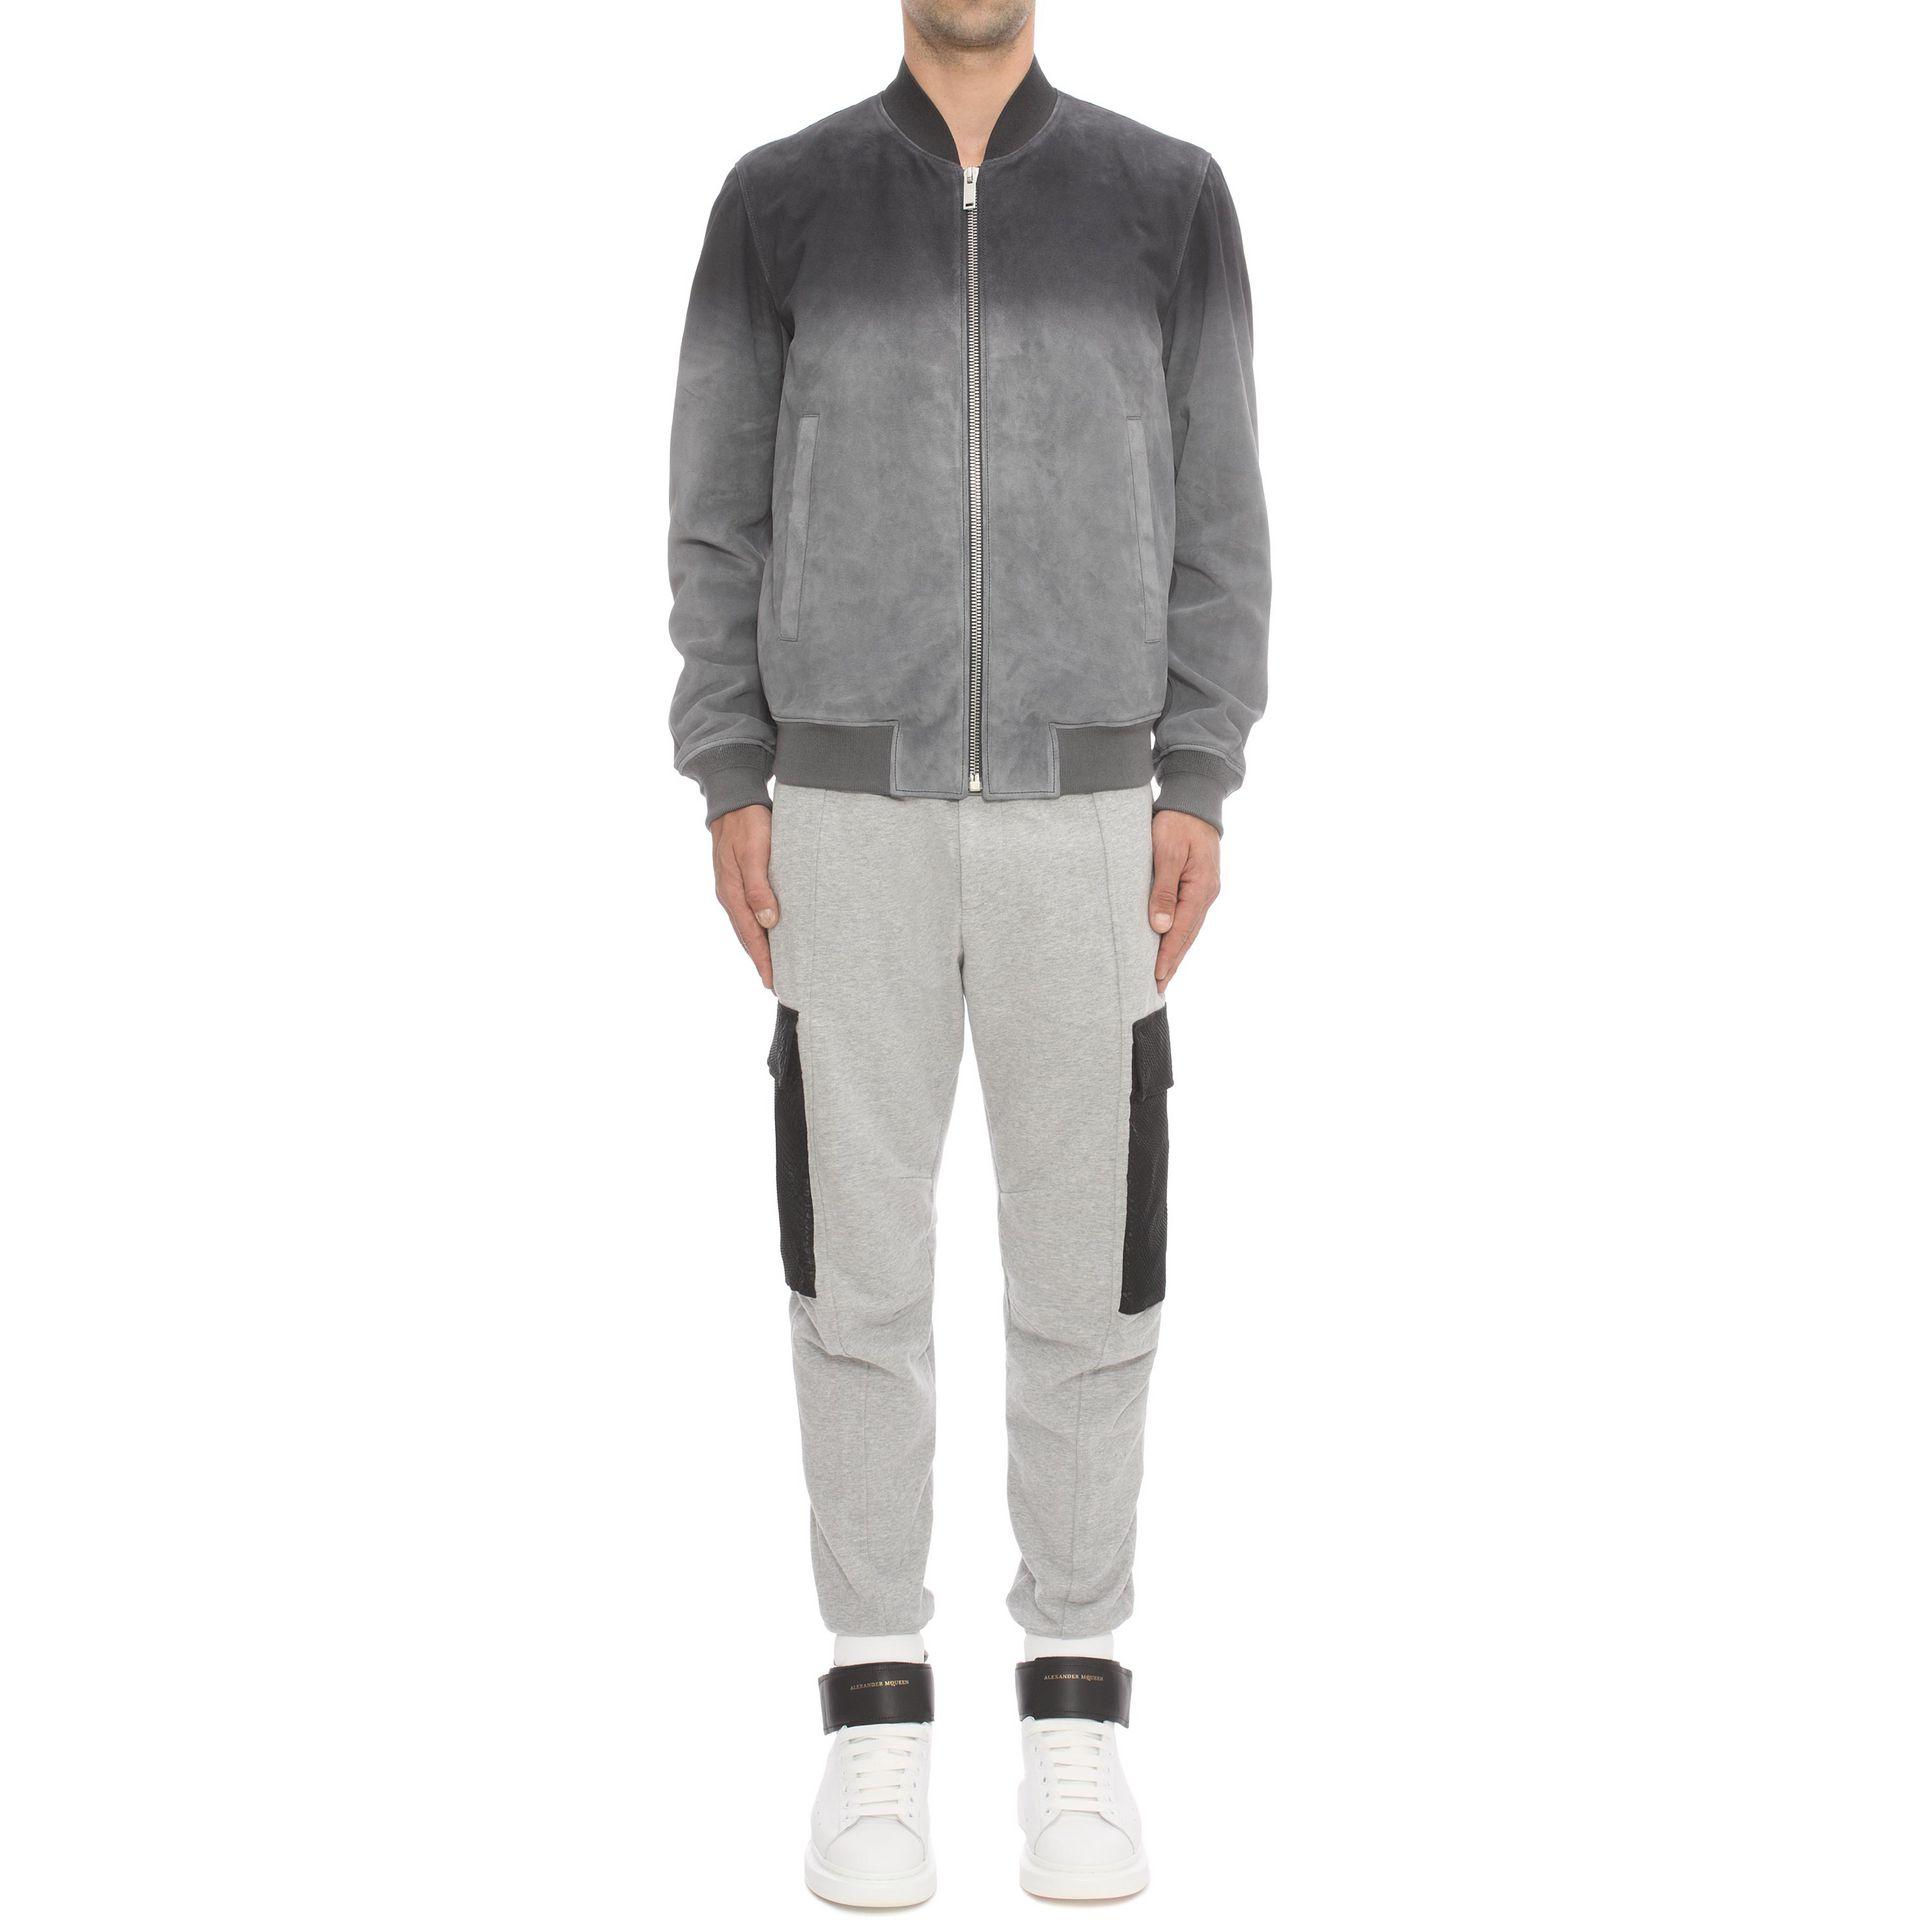 alexander mcqueen sweatshirt trousers in gray lyst. Black Bedroom Furniture Sets. Home Design Ideas